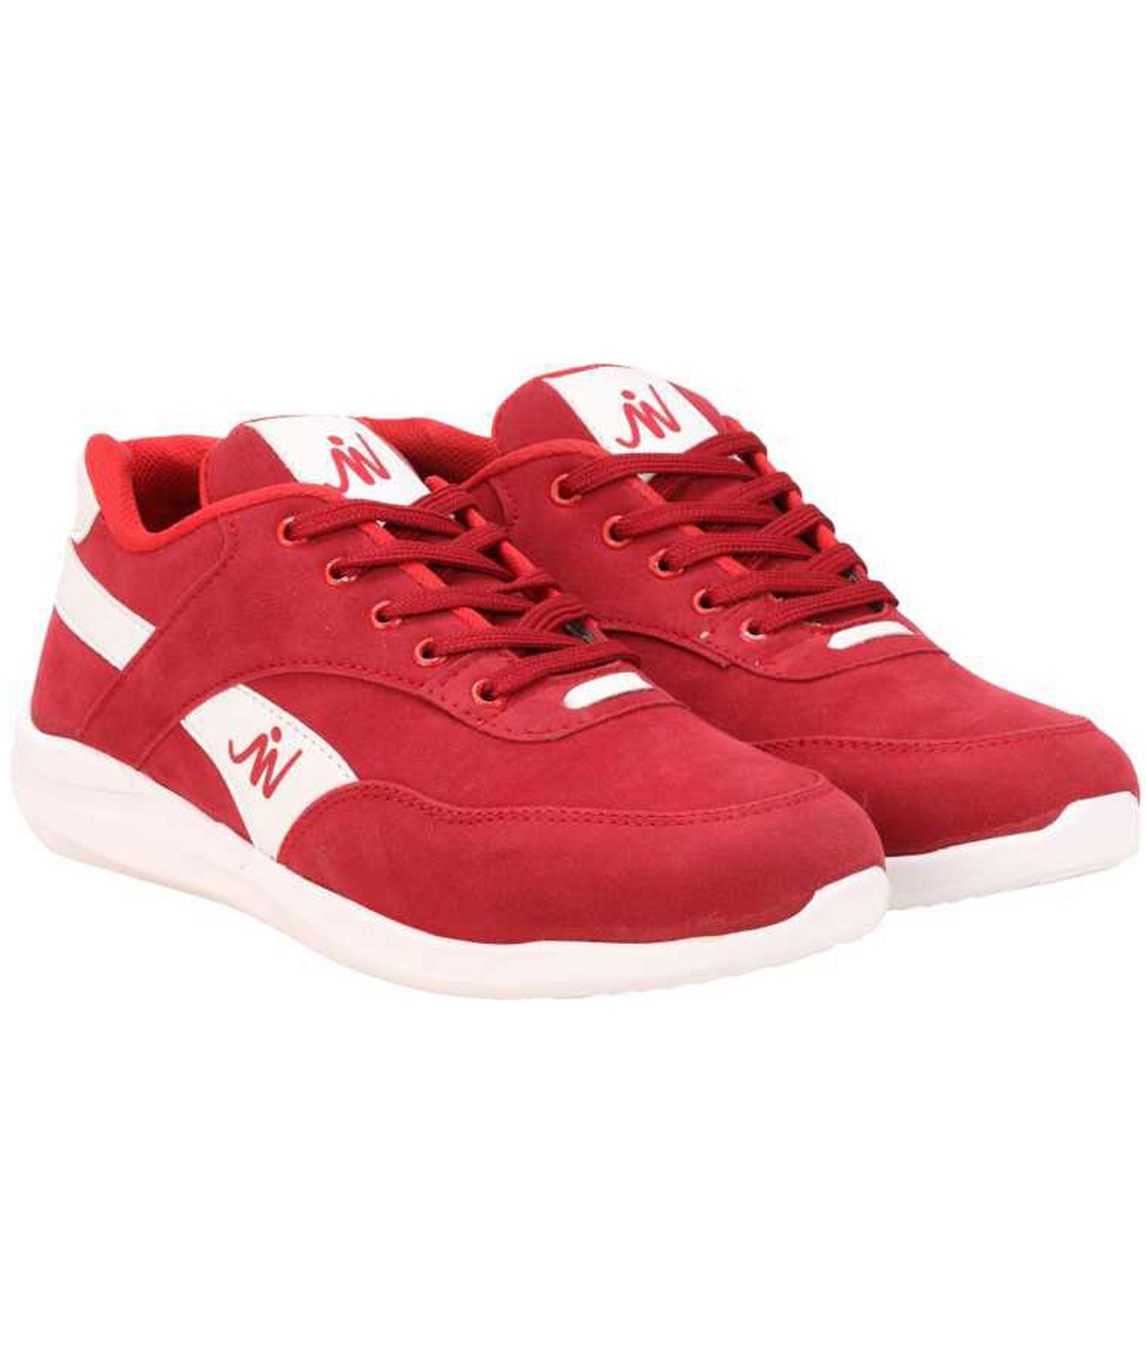 M-RBUK WALKING SHOES FOR MEN (RED)